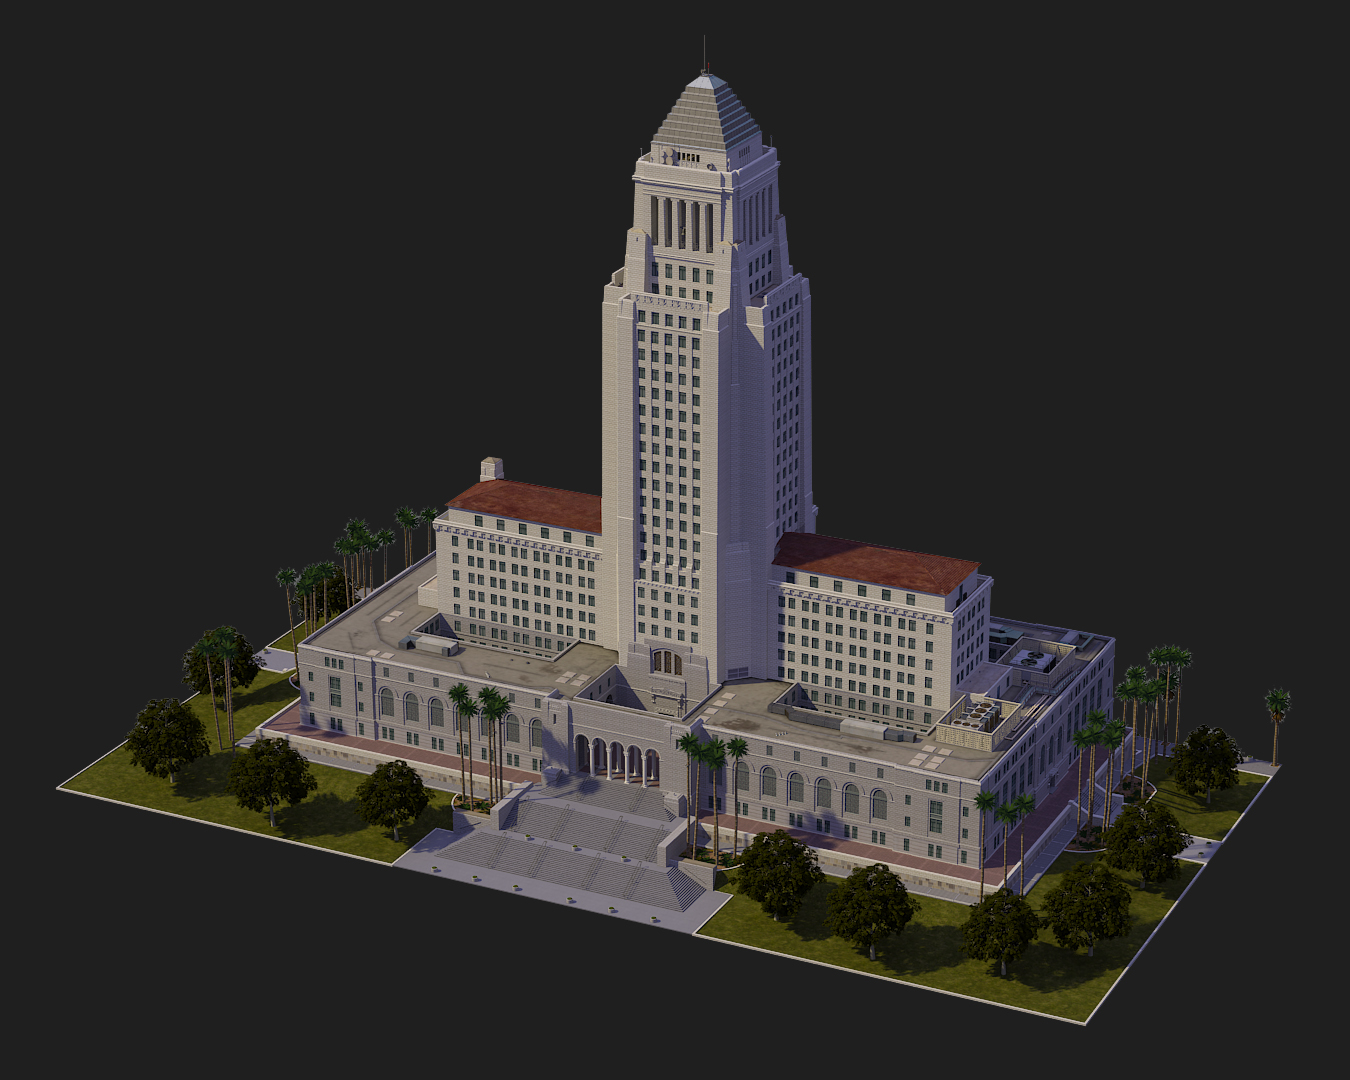 los angeles city hall matthew medina s 3d blog